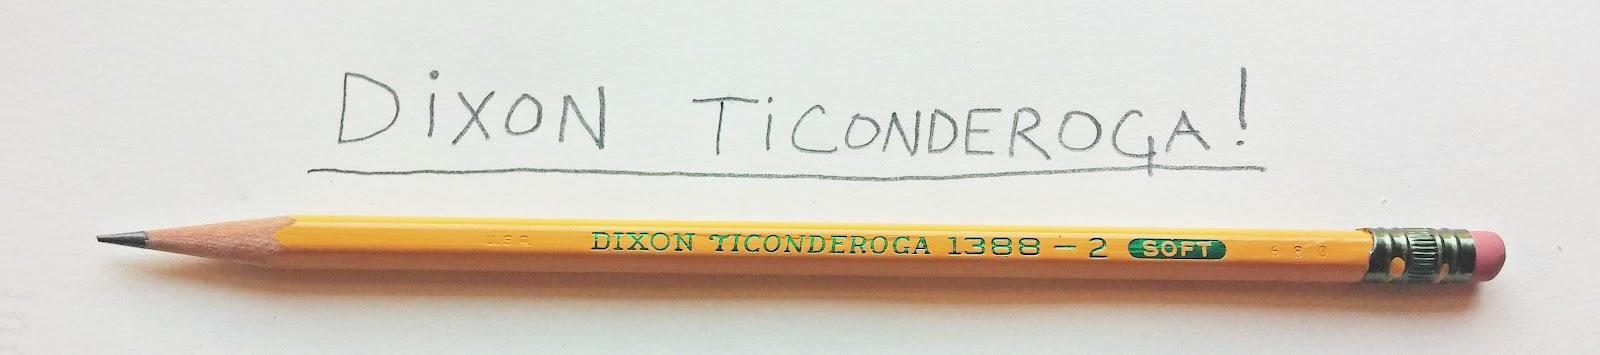 Dixon Ticonderoga 1.jpg